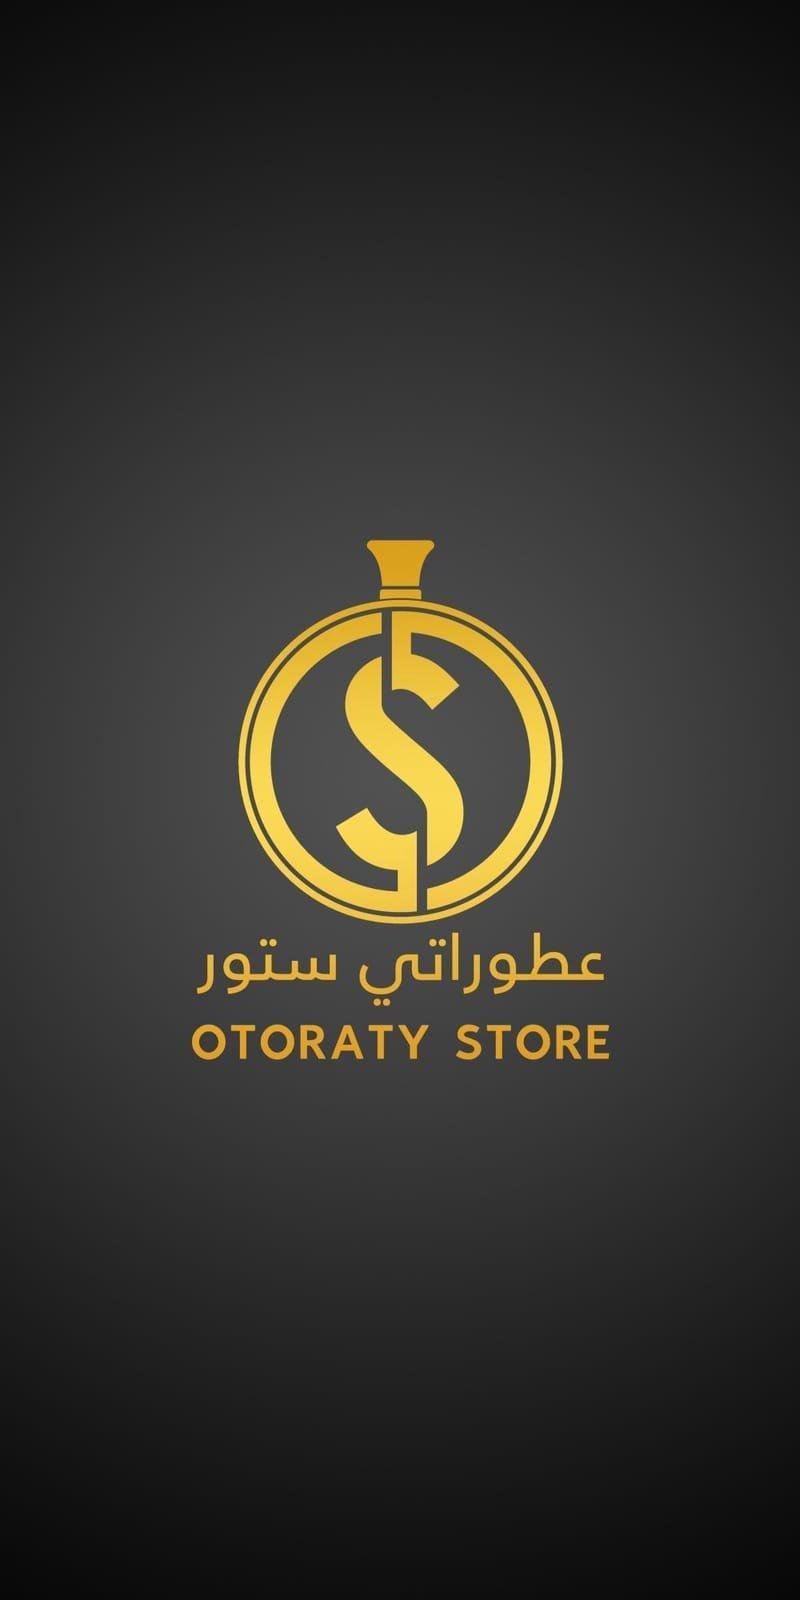 otoraty store عطوراتي ستور